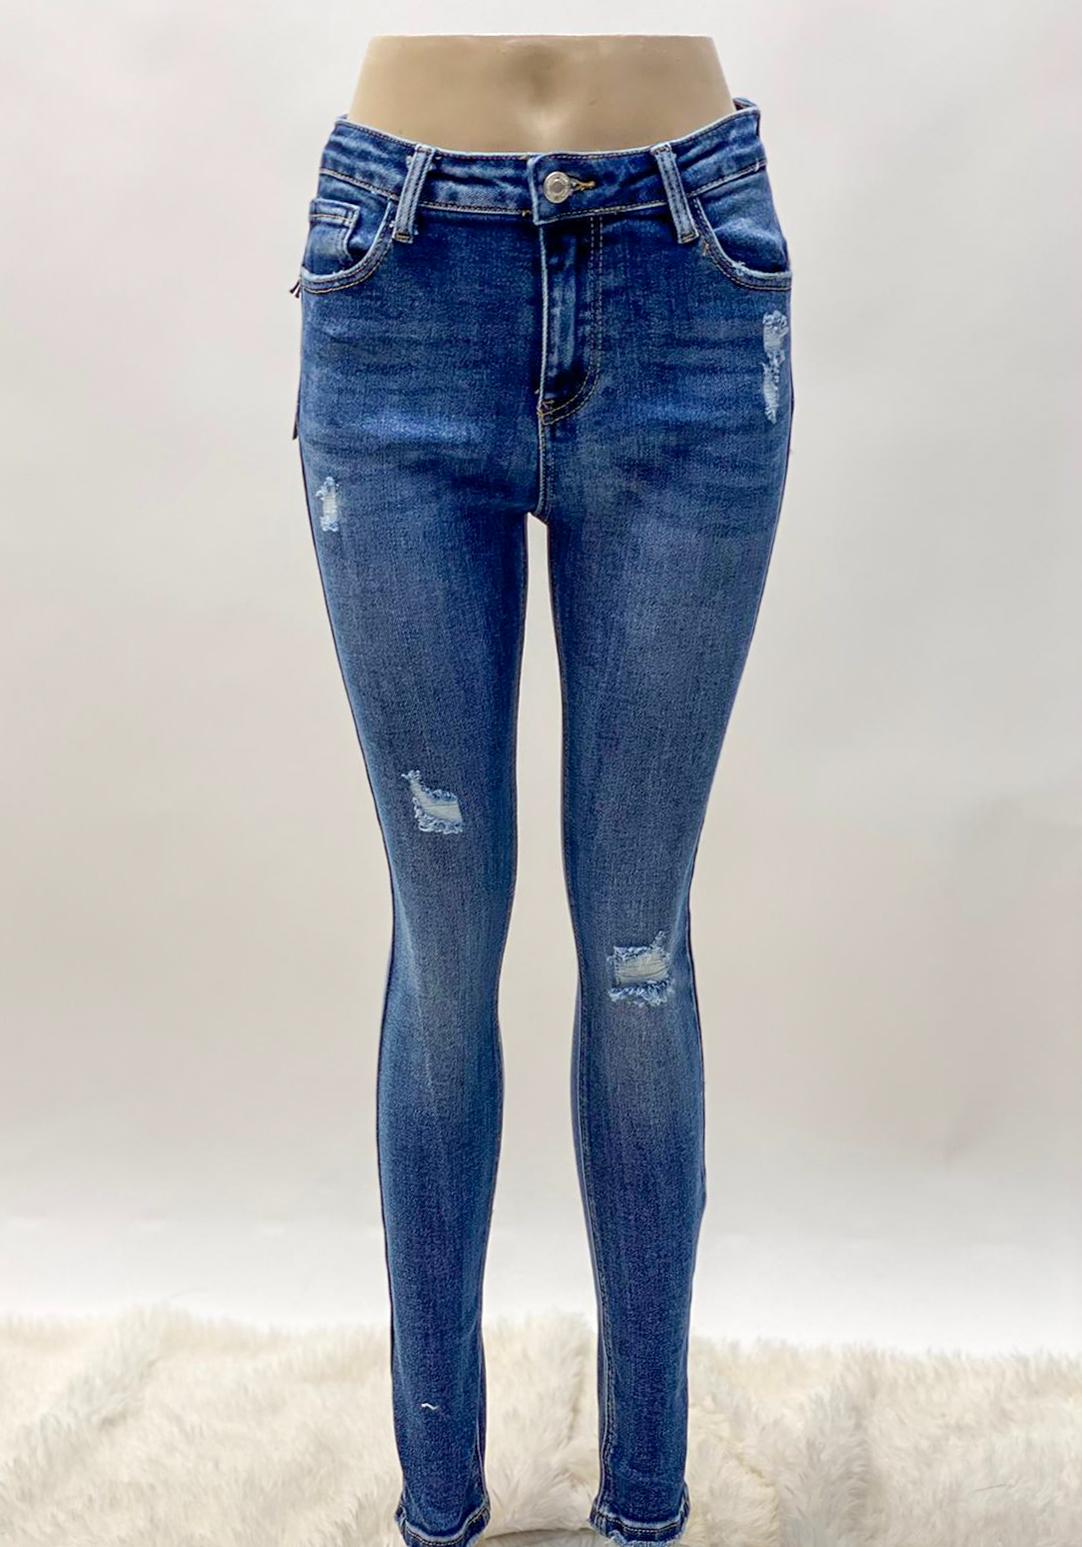 Jeanshose blue ripped